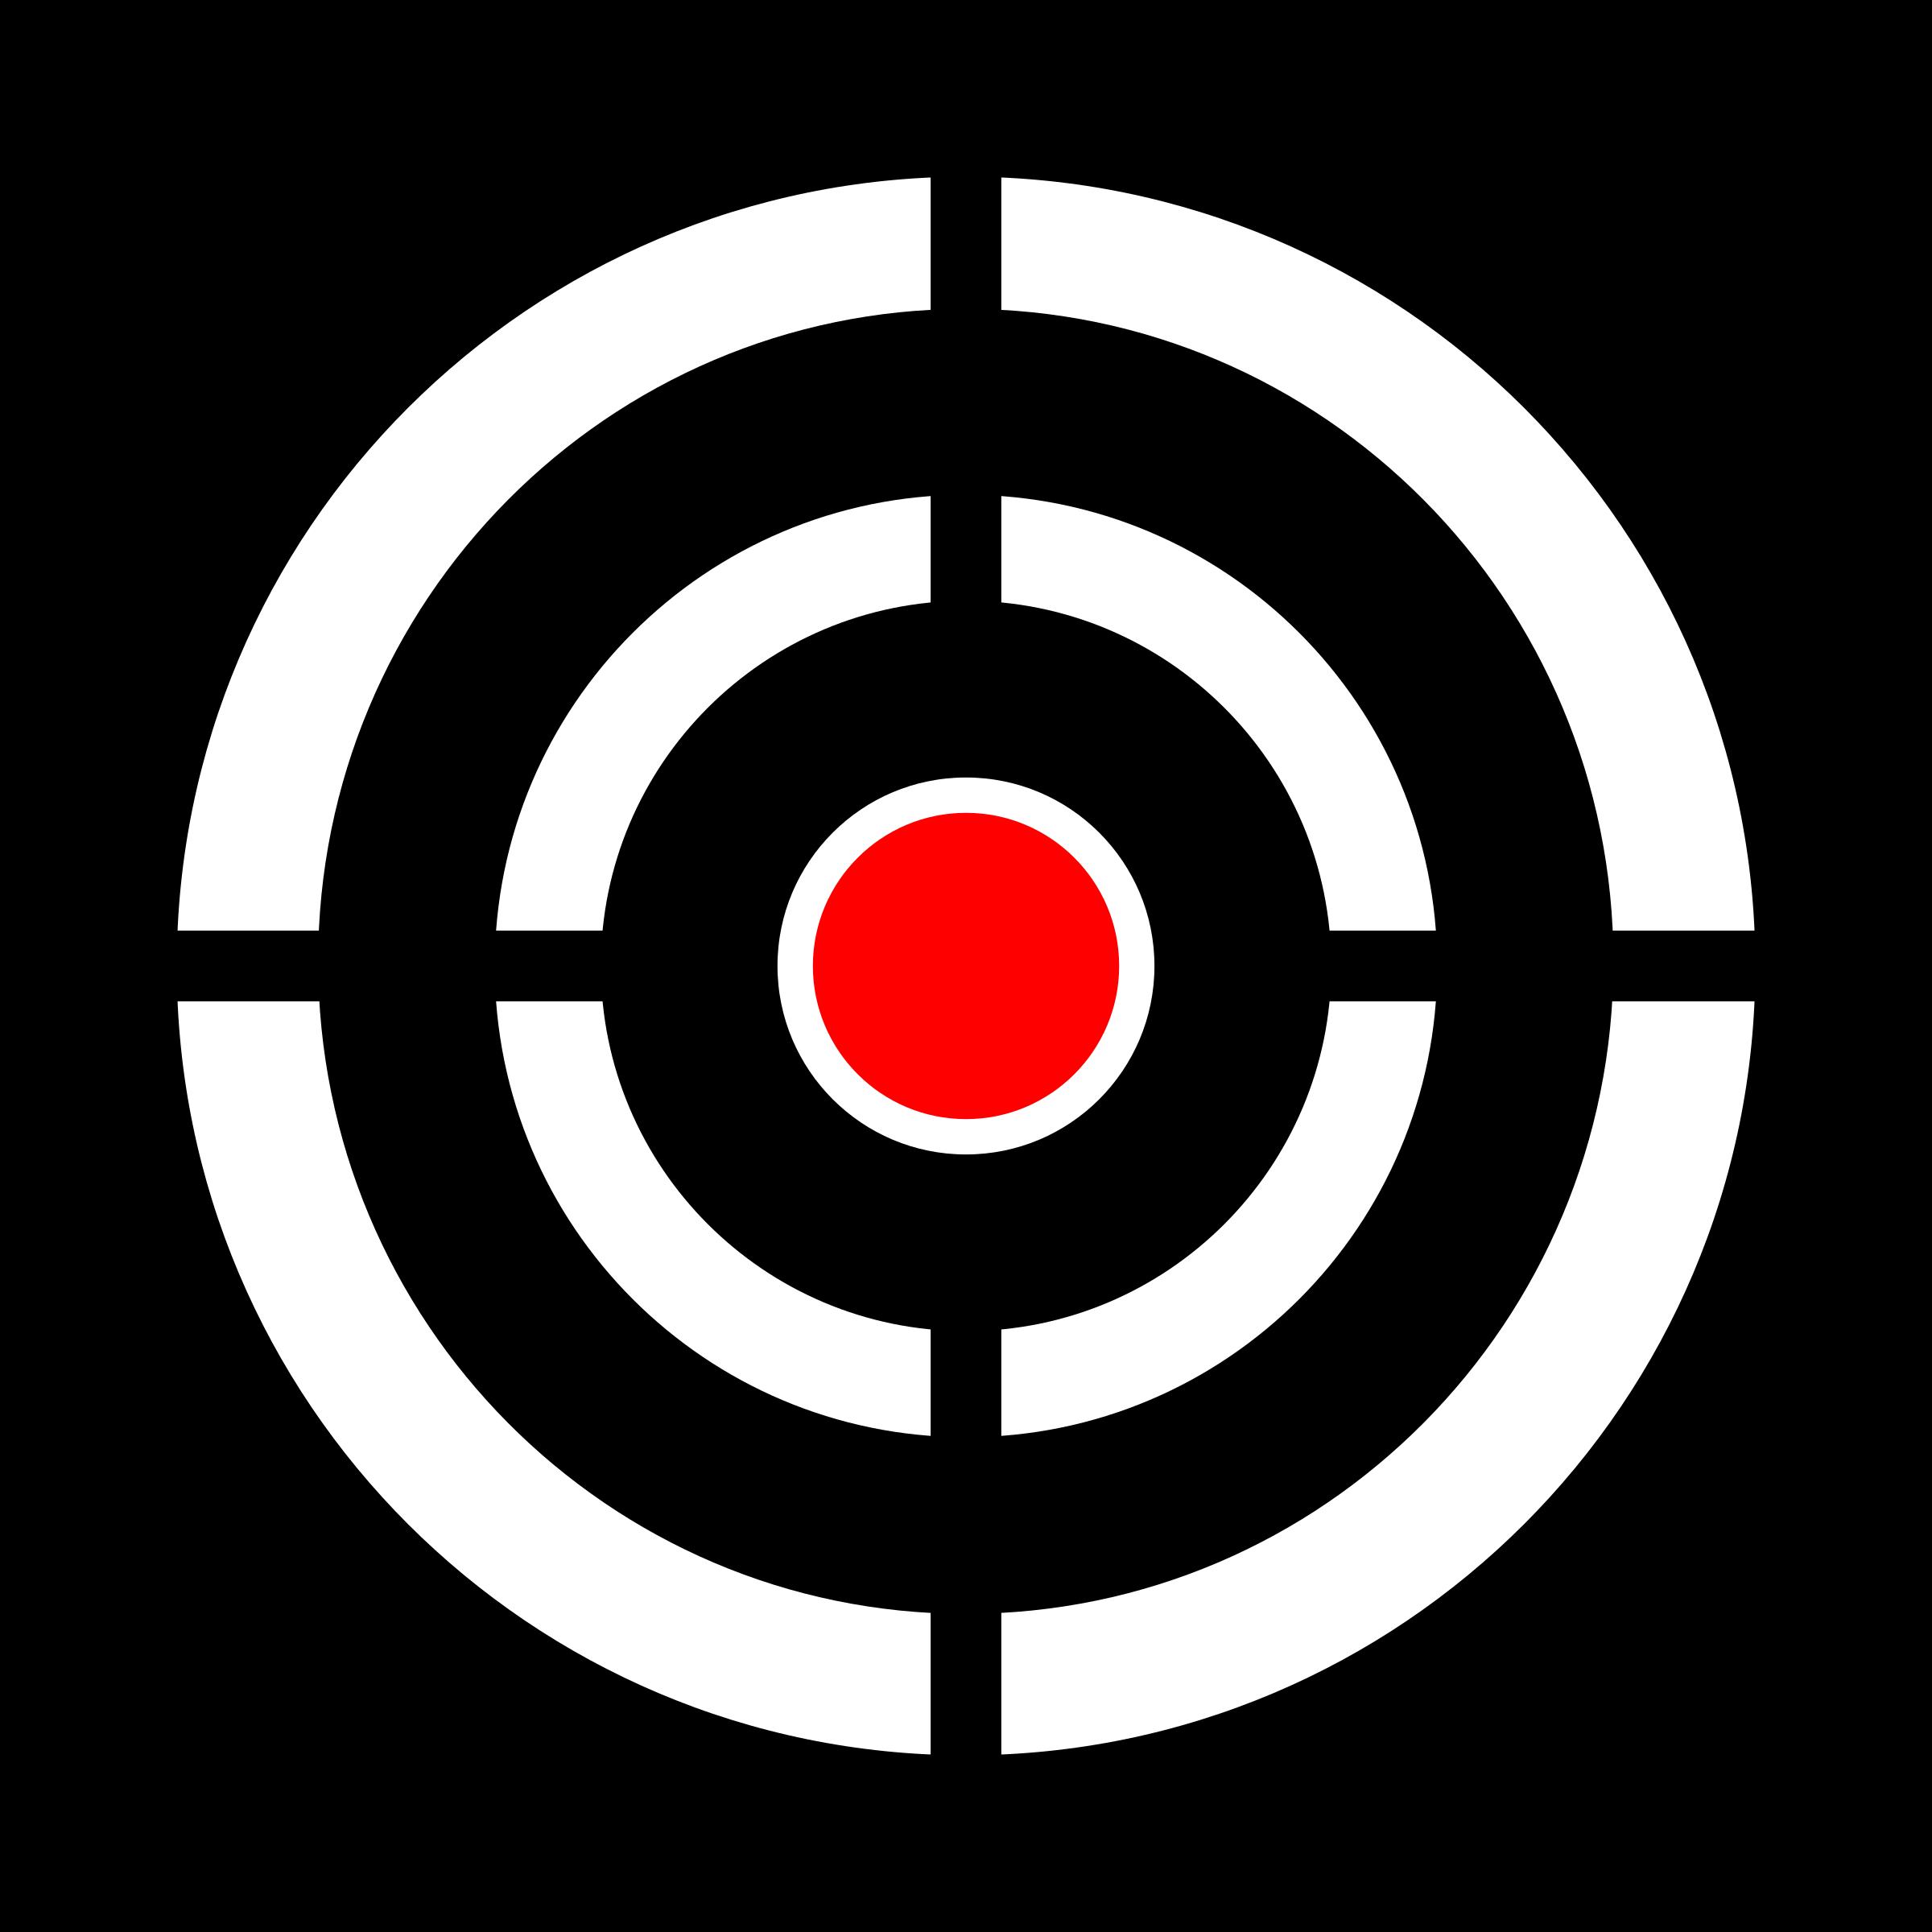 Target PNG - 2797